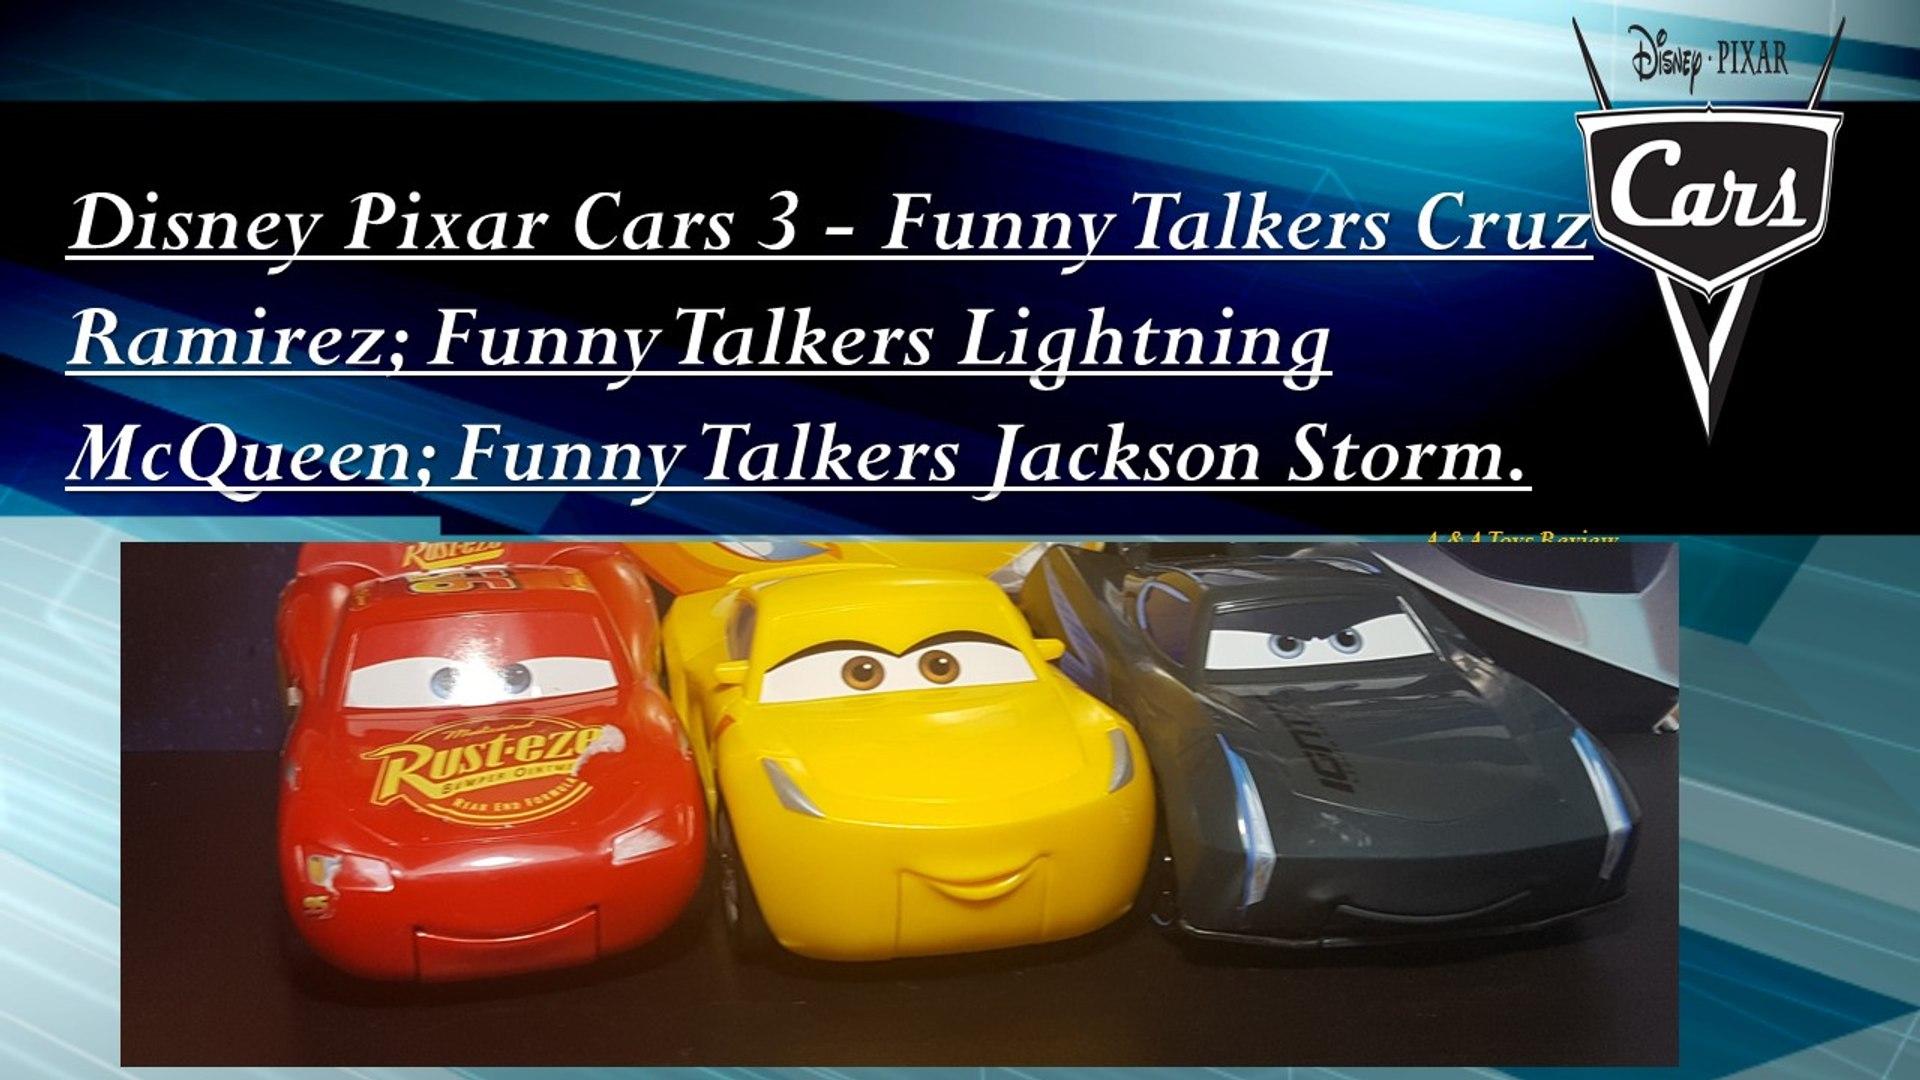 Car 3 Funny Talkers Lightning Mcqueen Jackson Storm Cruz Ramirez